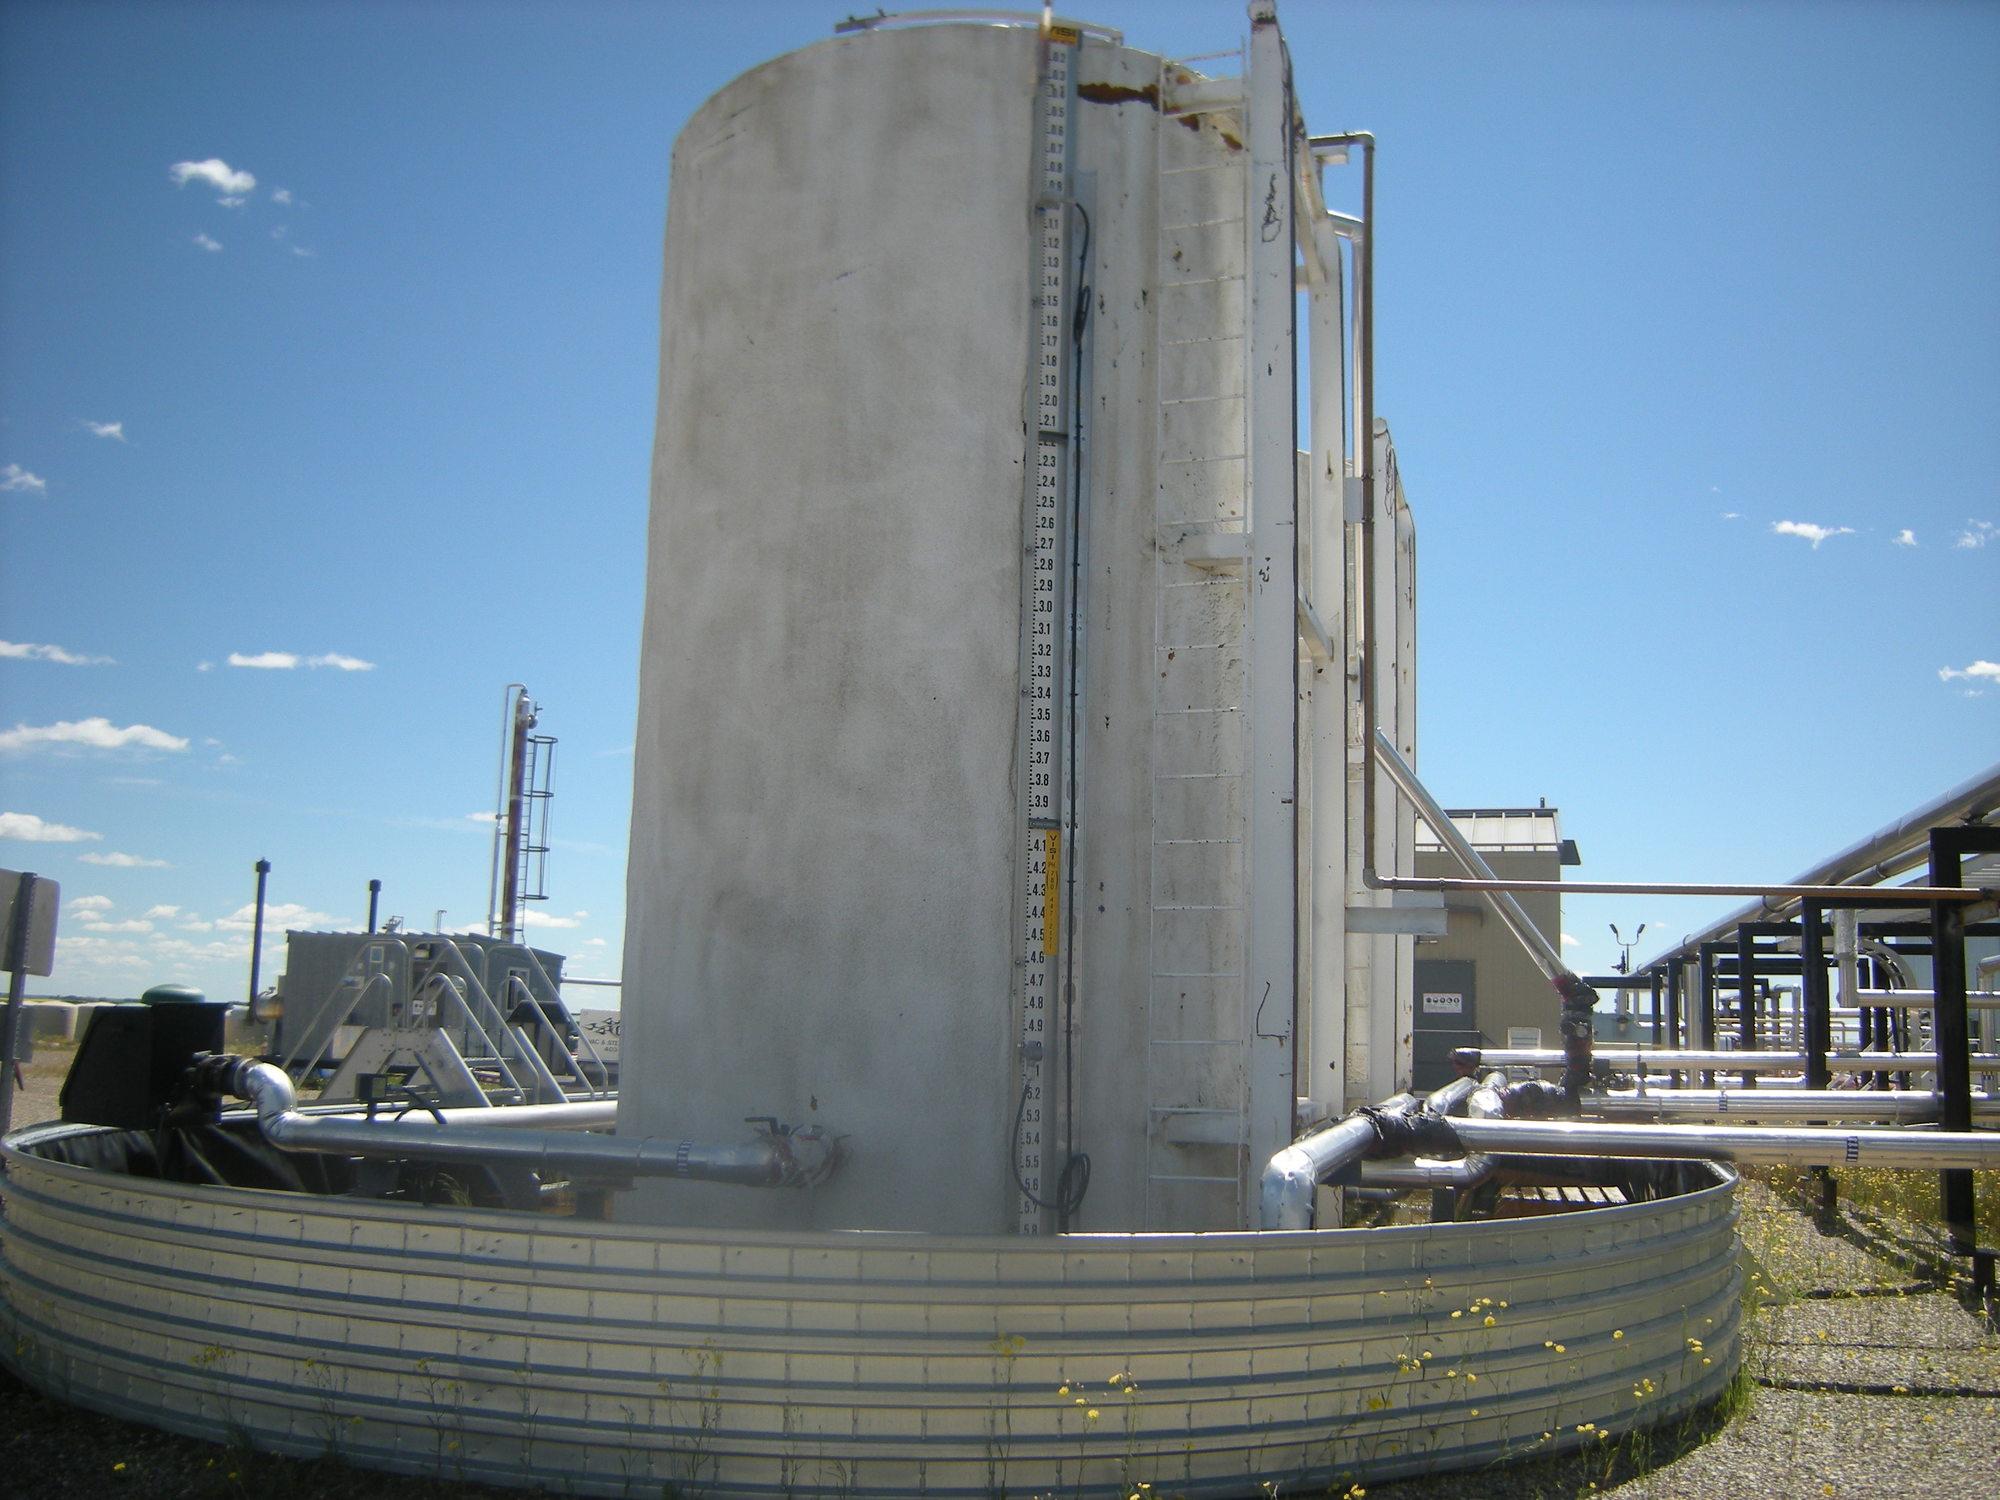 1998 storage tank 400 bbl